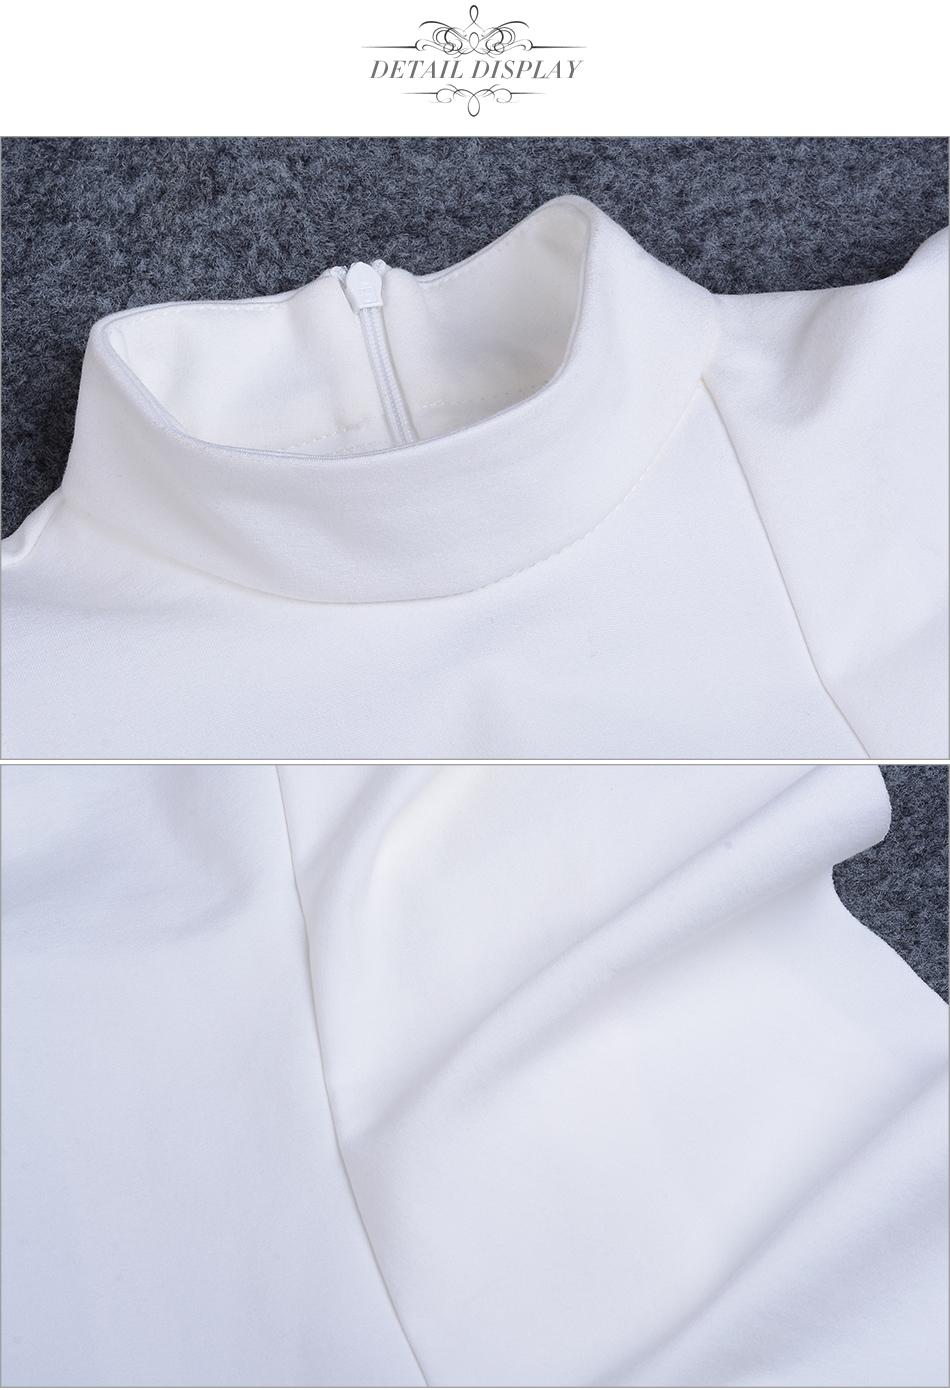 Adyce 2017 New Style Summer Dress Women Sexy White Sleeveless Patchwork Ruffles Mini Bodycon Vestidos Party Dresses Clubwear 20